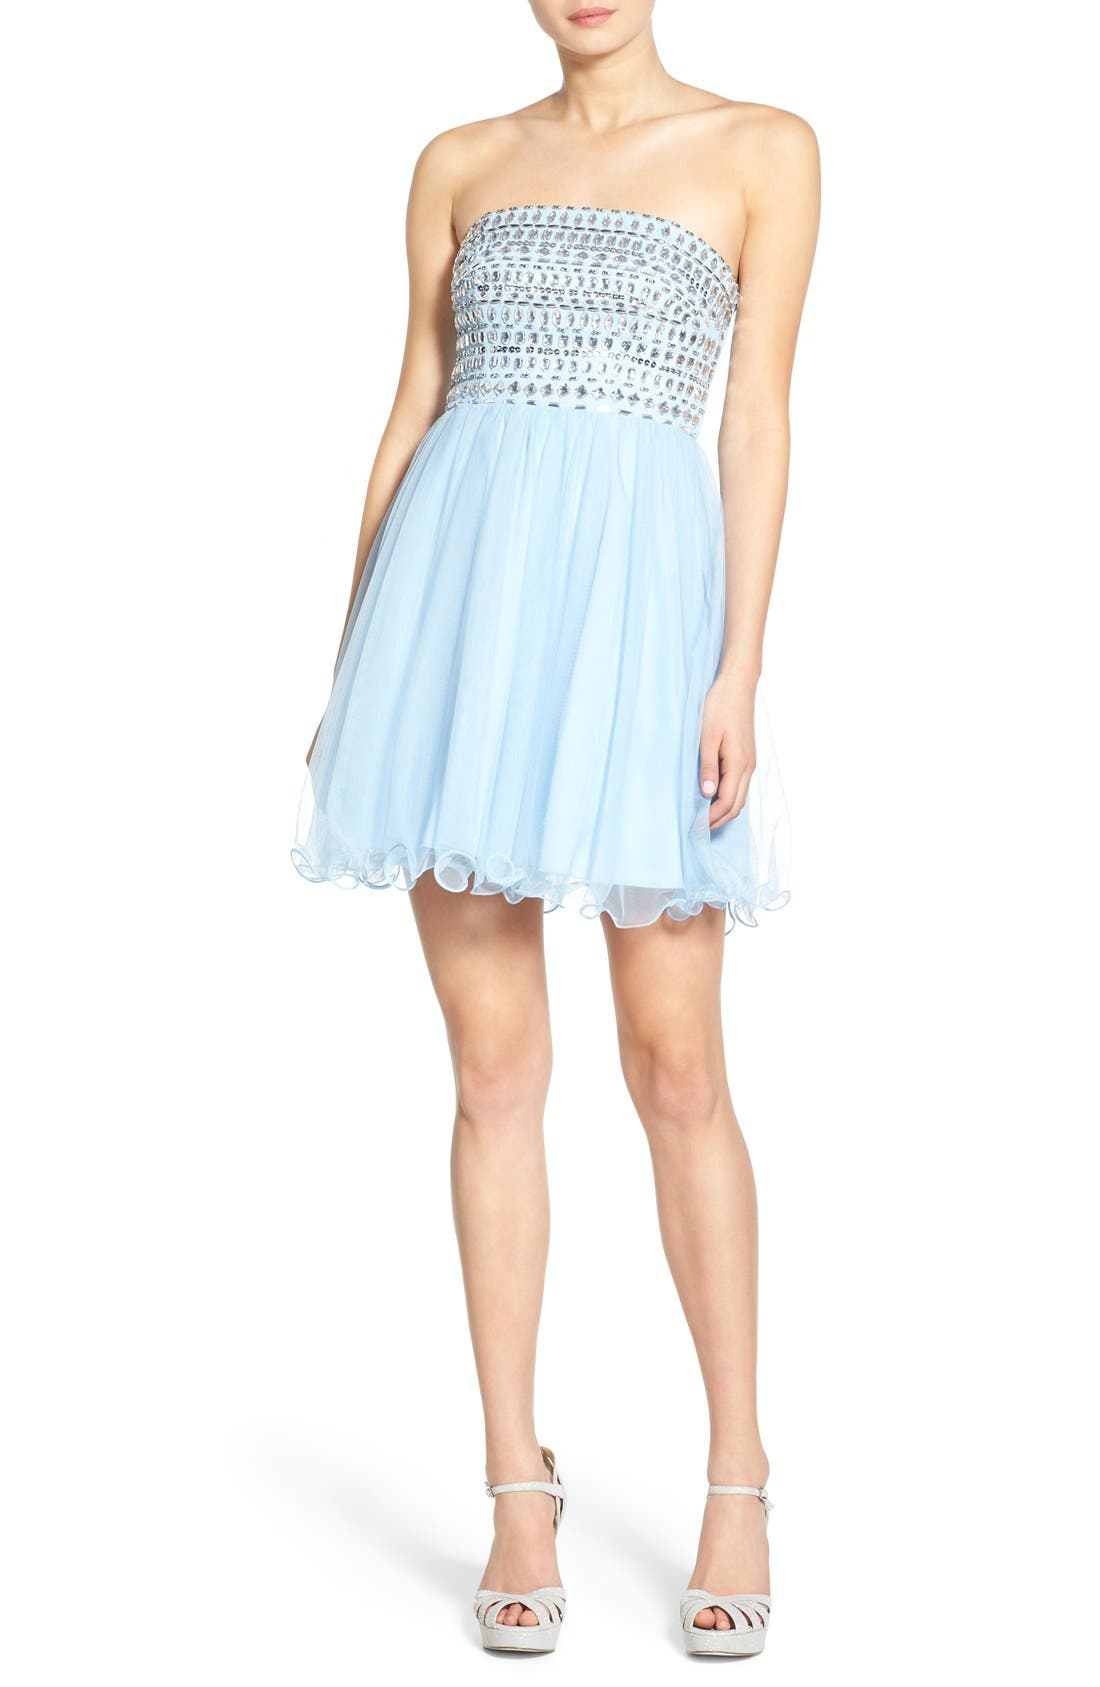 Alternate Image 1 Selected - Sequin Hearts Rhinestone Bodice Strapless Dress